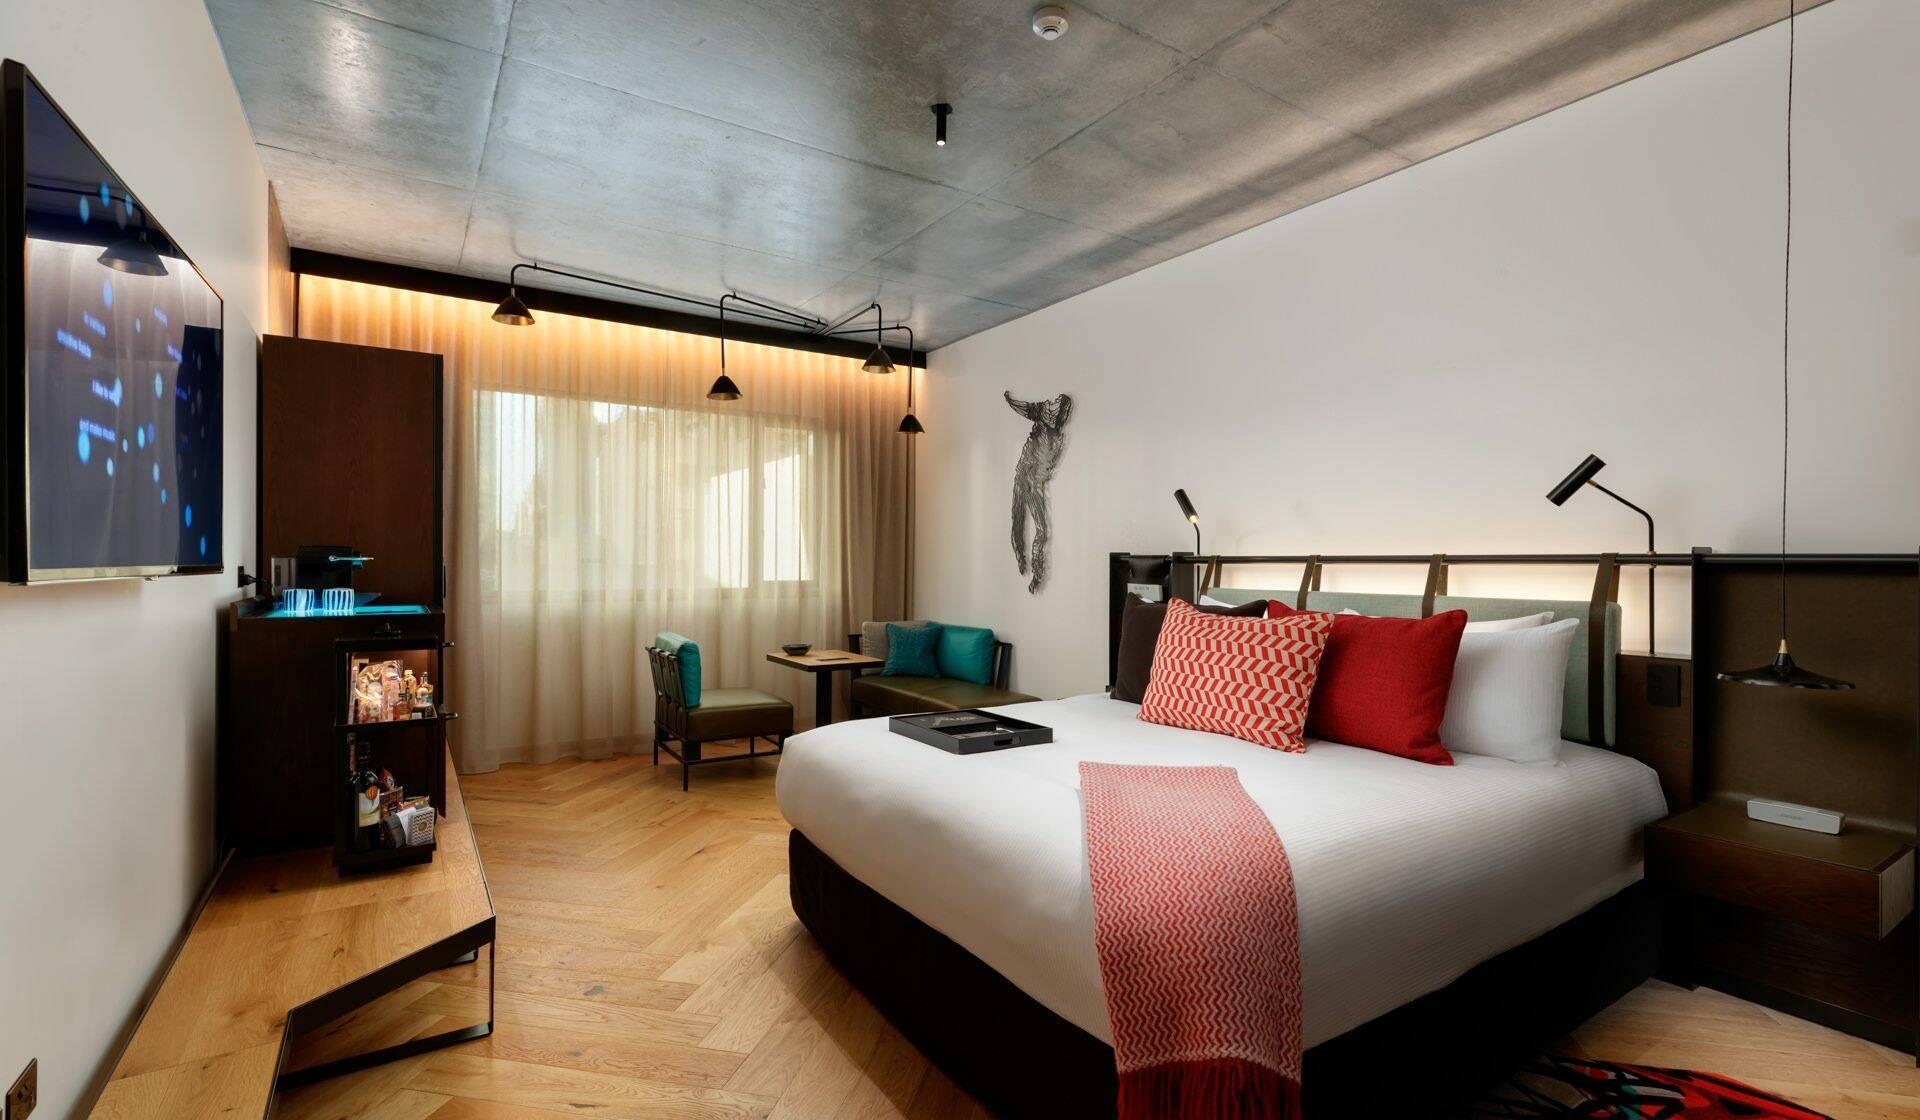 Melbourne QT Hotel Chambre